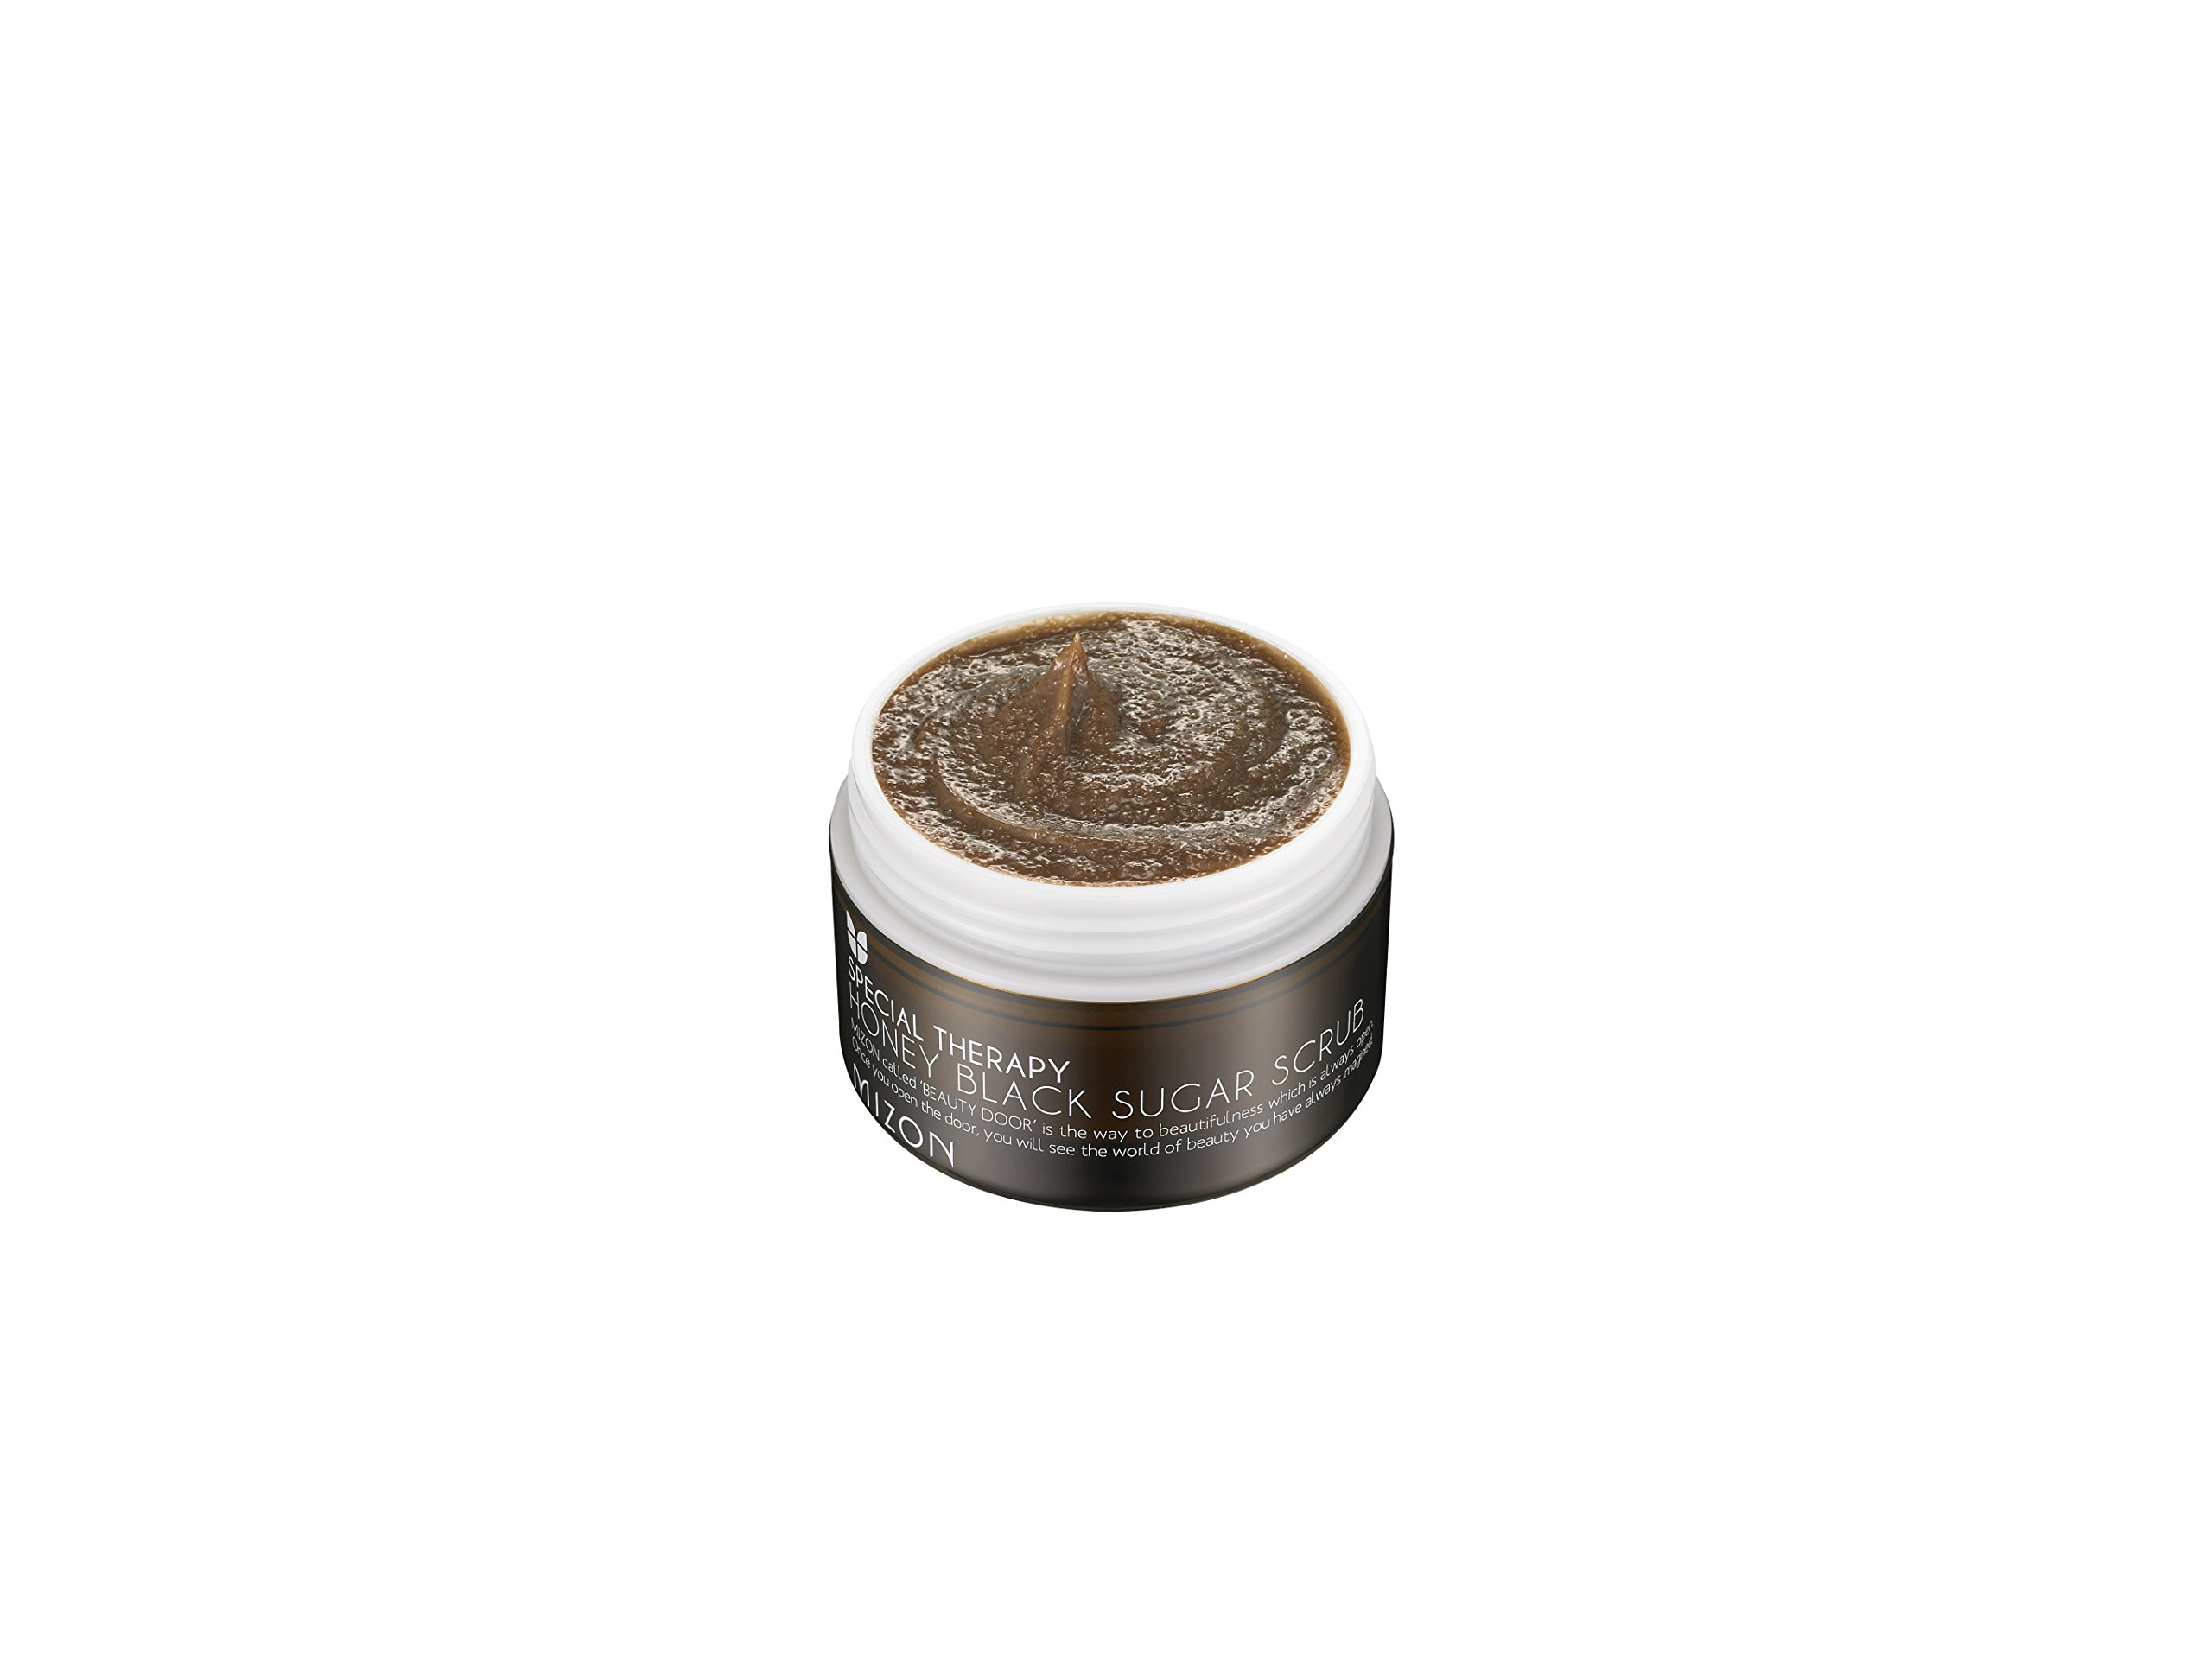 Mizon Honey Black Sugar Scrub, Brown Sugar Facial Scrub, Face Scrub & Efoliating, Black Head and White Head Care with Natural Brown Sugar Powder, Moisturizing, Soft Skin, Removes Dead Skin Cells, 80g